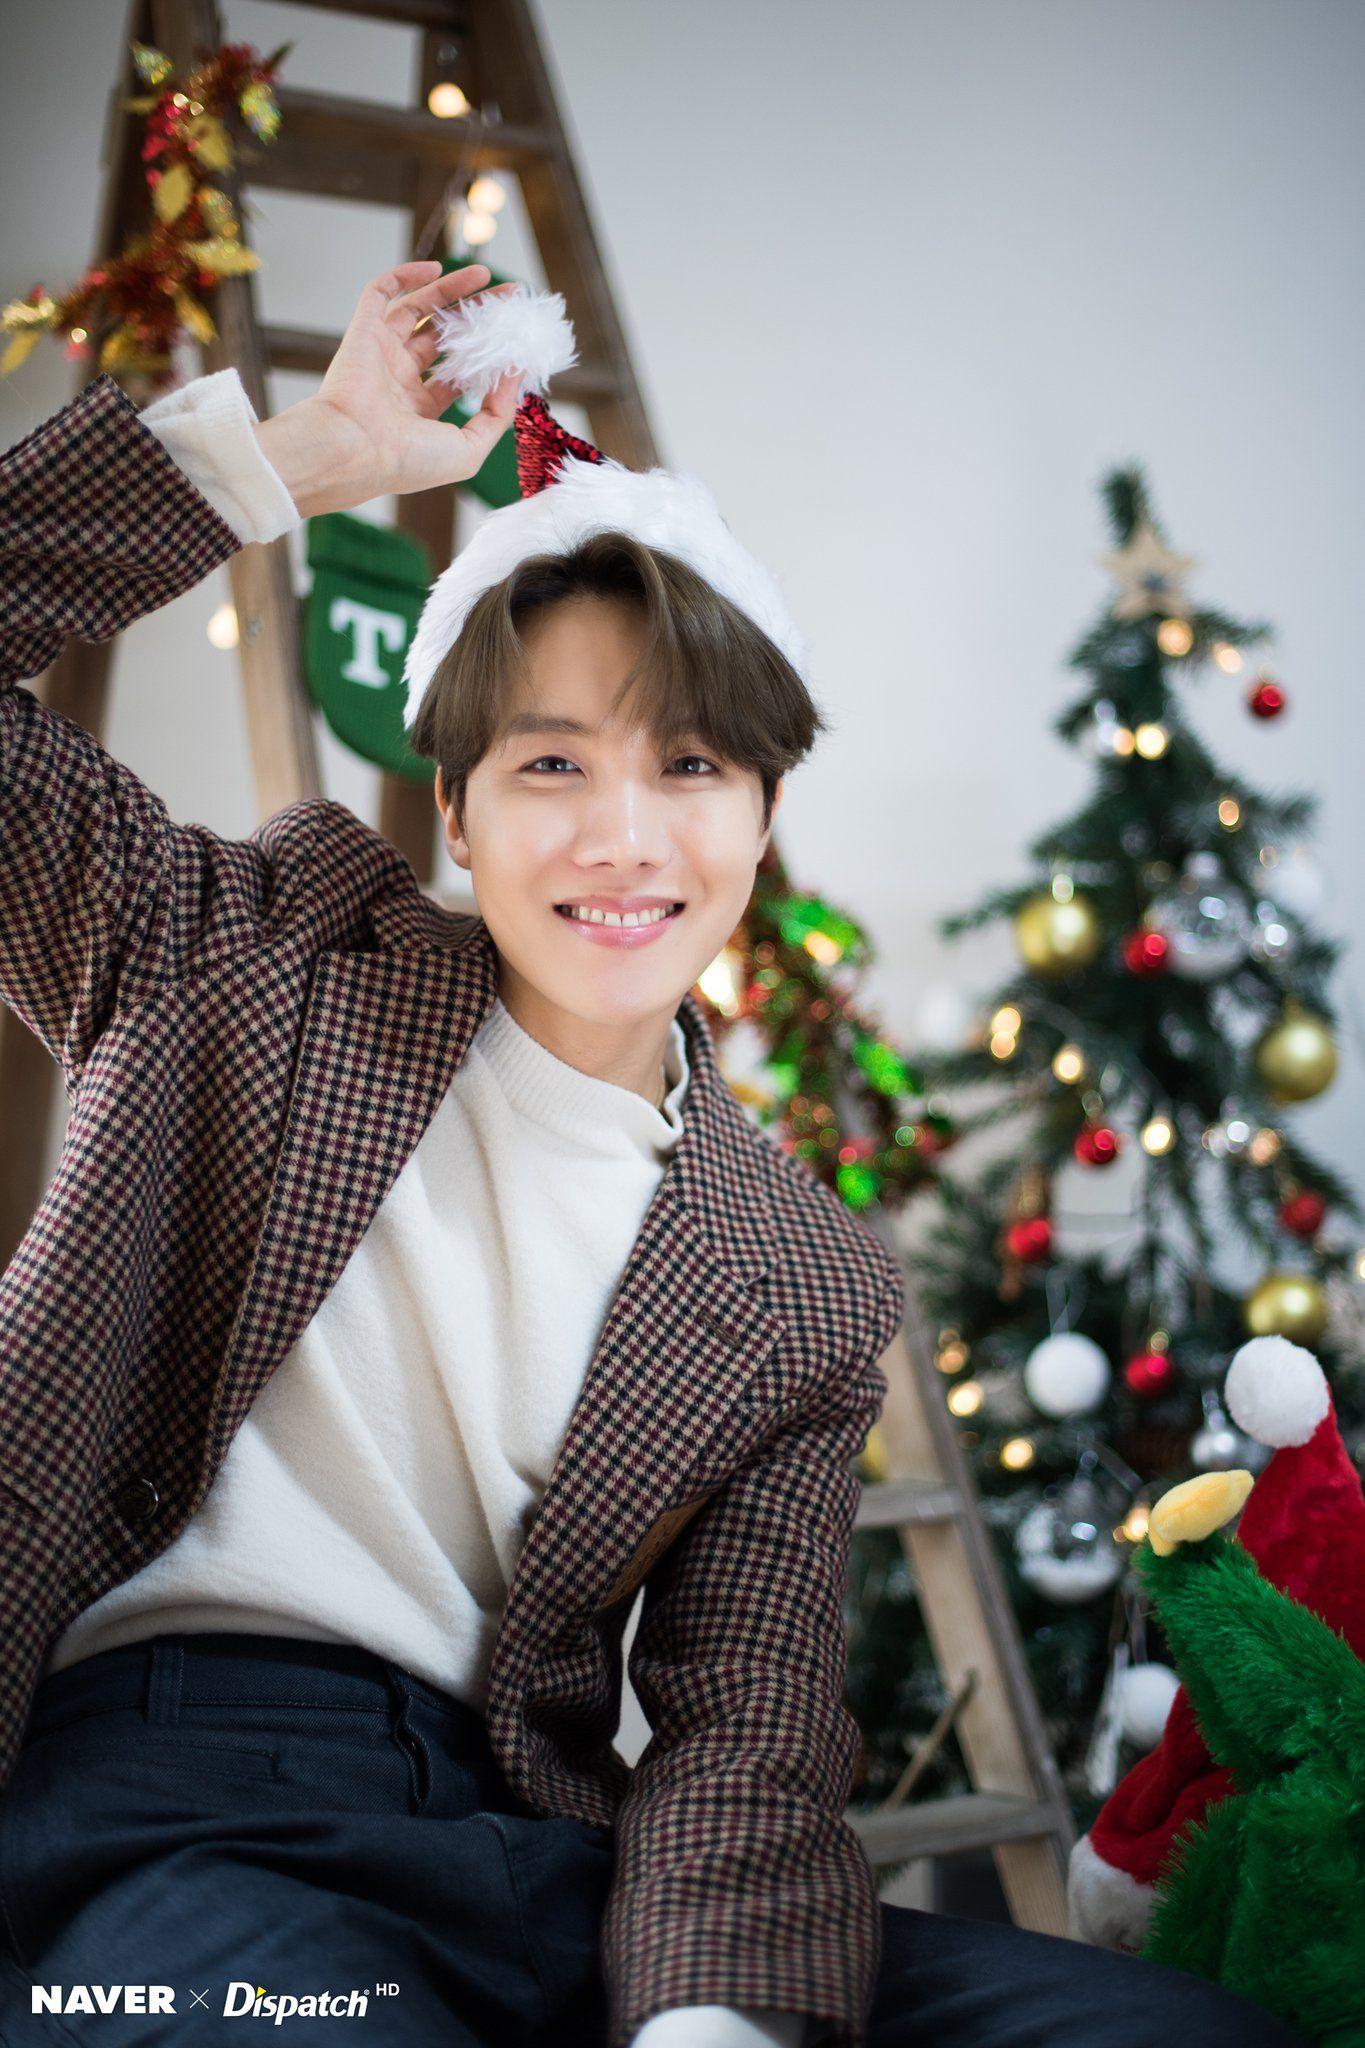 Guatemala A R M Y On Twitter Bts Christmas Bts Dispatch Bts J Hope